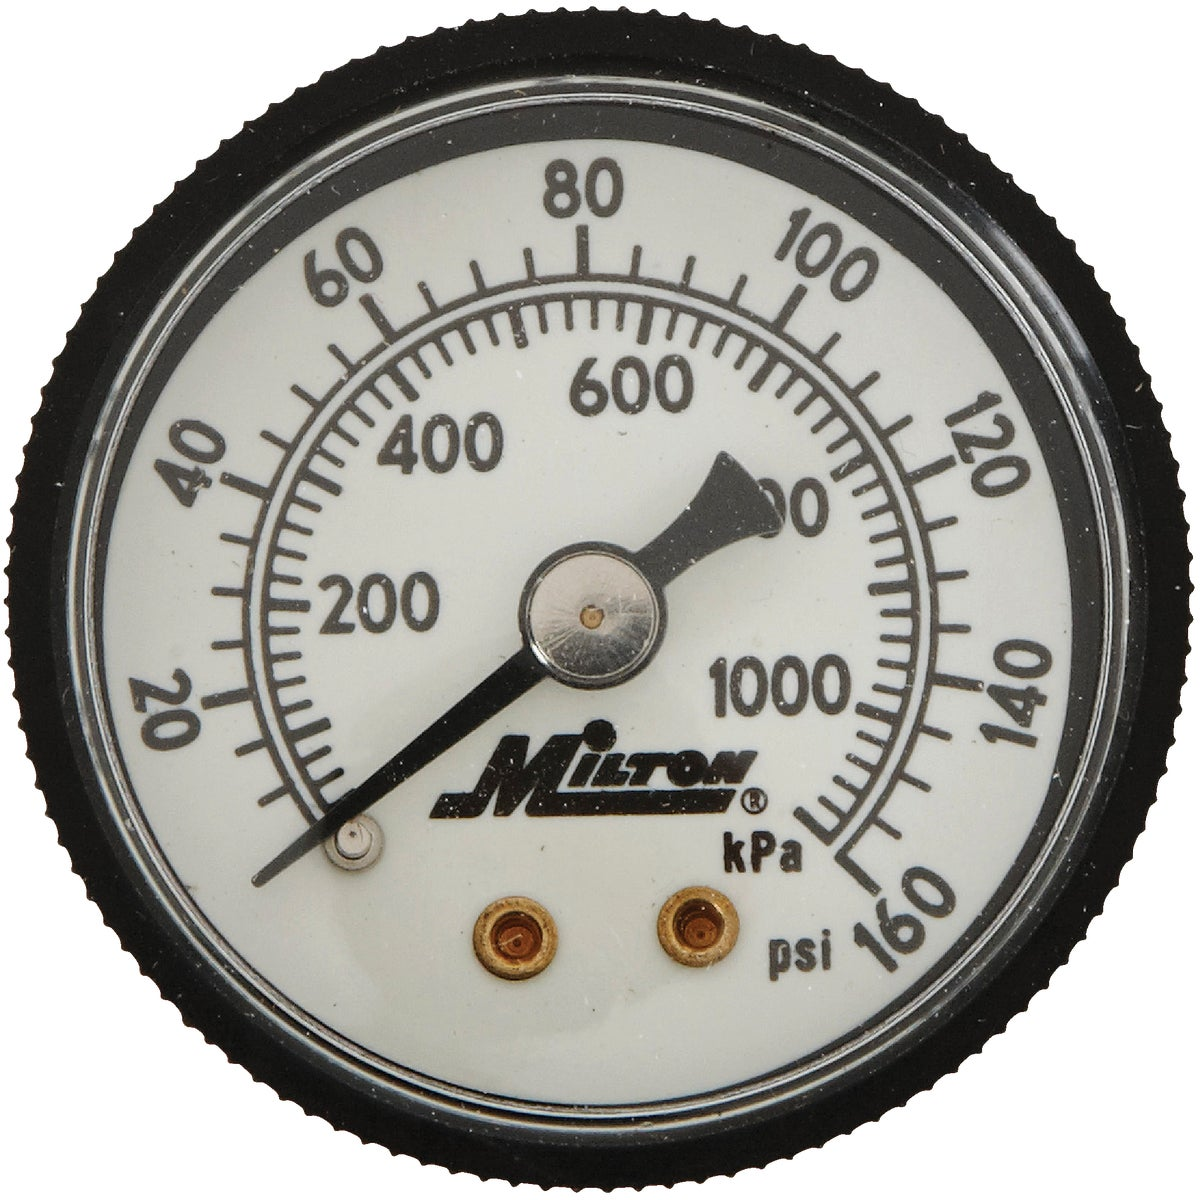 1/8 NPT MINI GAGE - 1189 by Milton Ind/ Incom